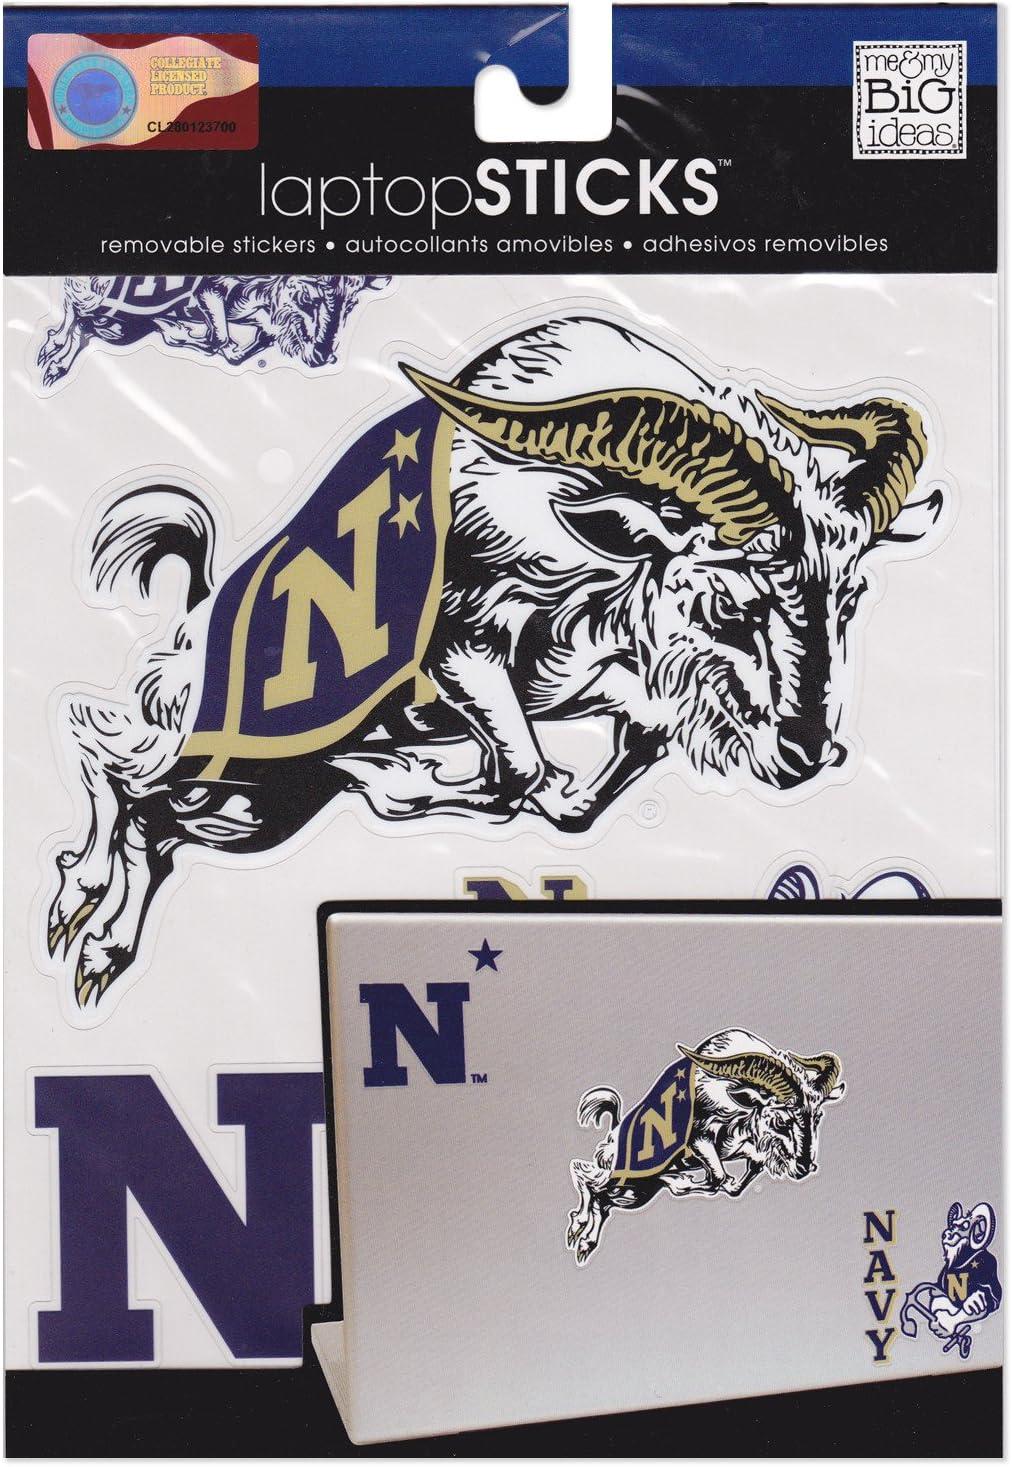 me & my BIG ideas laptopSTICKS Removable Laptop Stickers, United States Naval Academy (Navy) Midshipmen